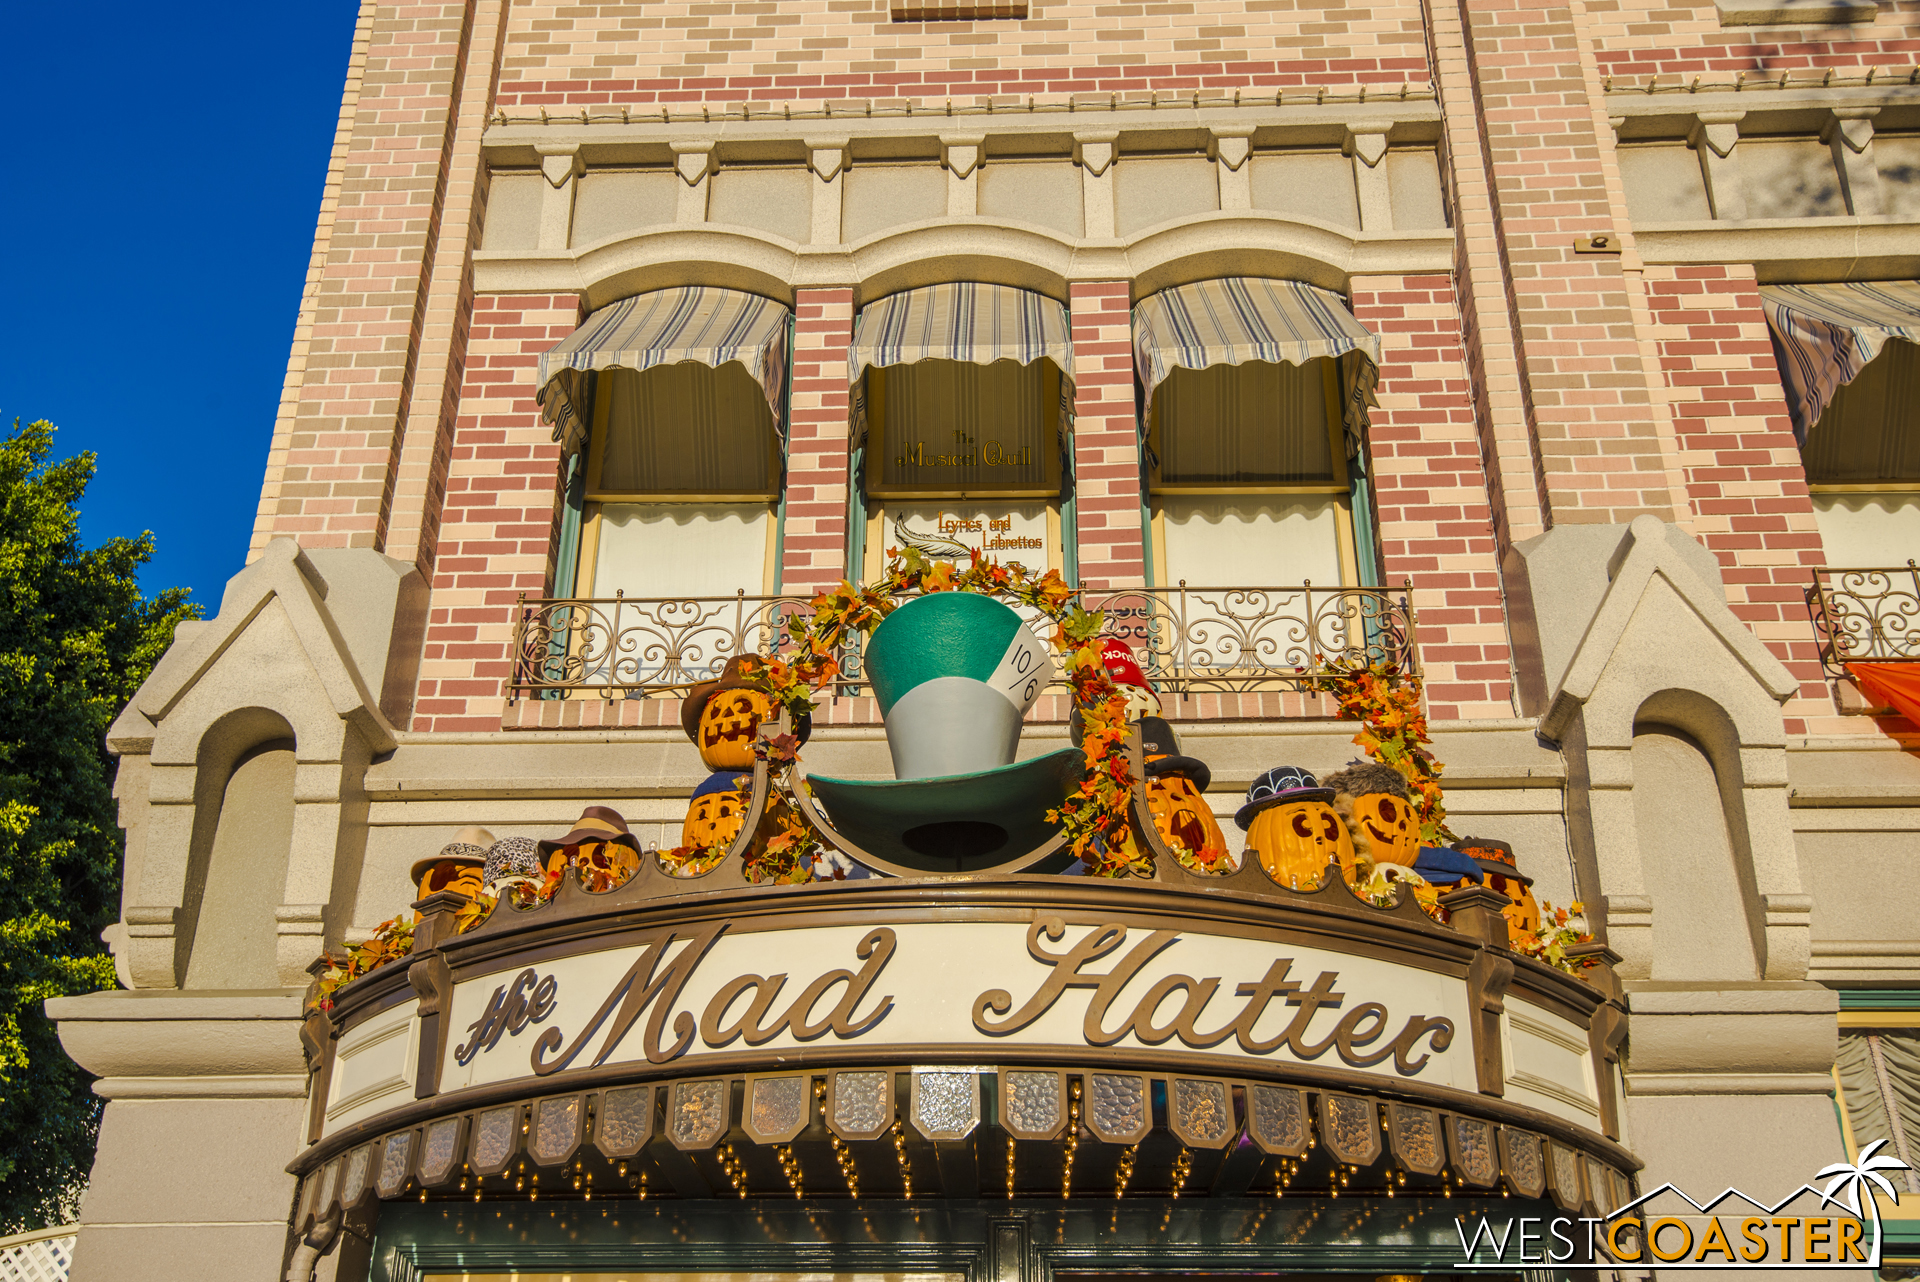 Smaller jack-o-lanterns dot the storefronts of Main Street.